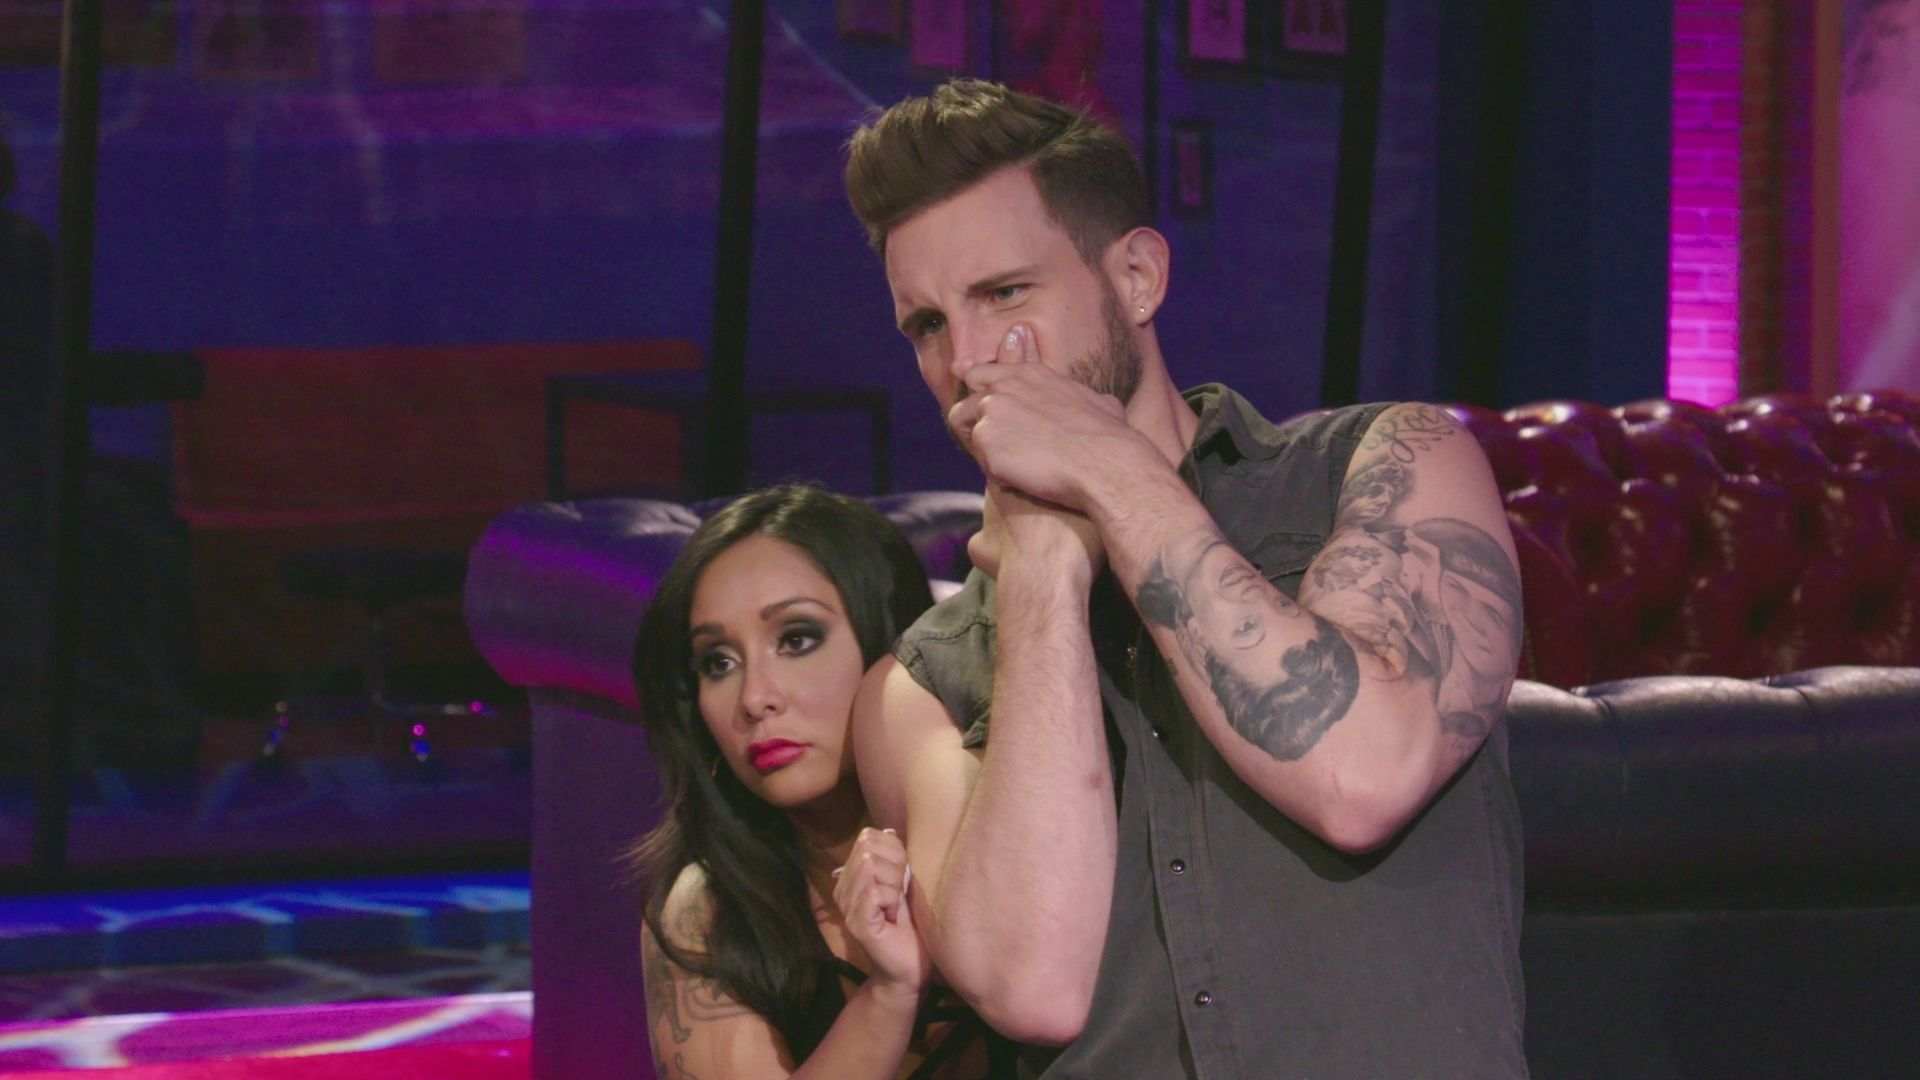 How Far Is Tattoo Far? - Season 1, Ep. 4 - Mamma Knows Best - Full Episode | MTV